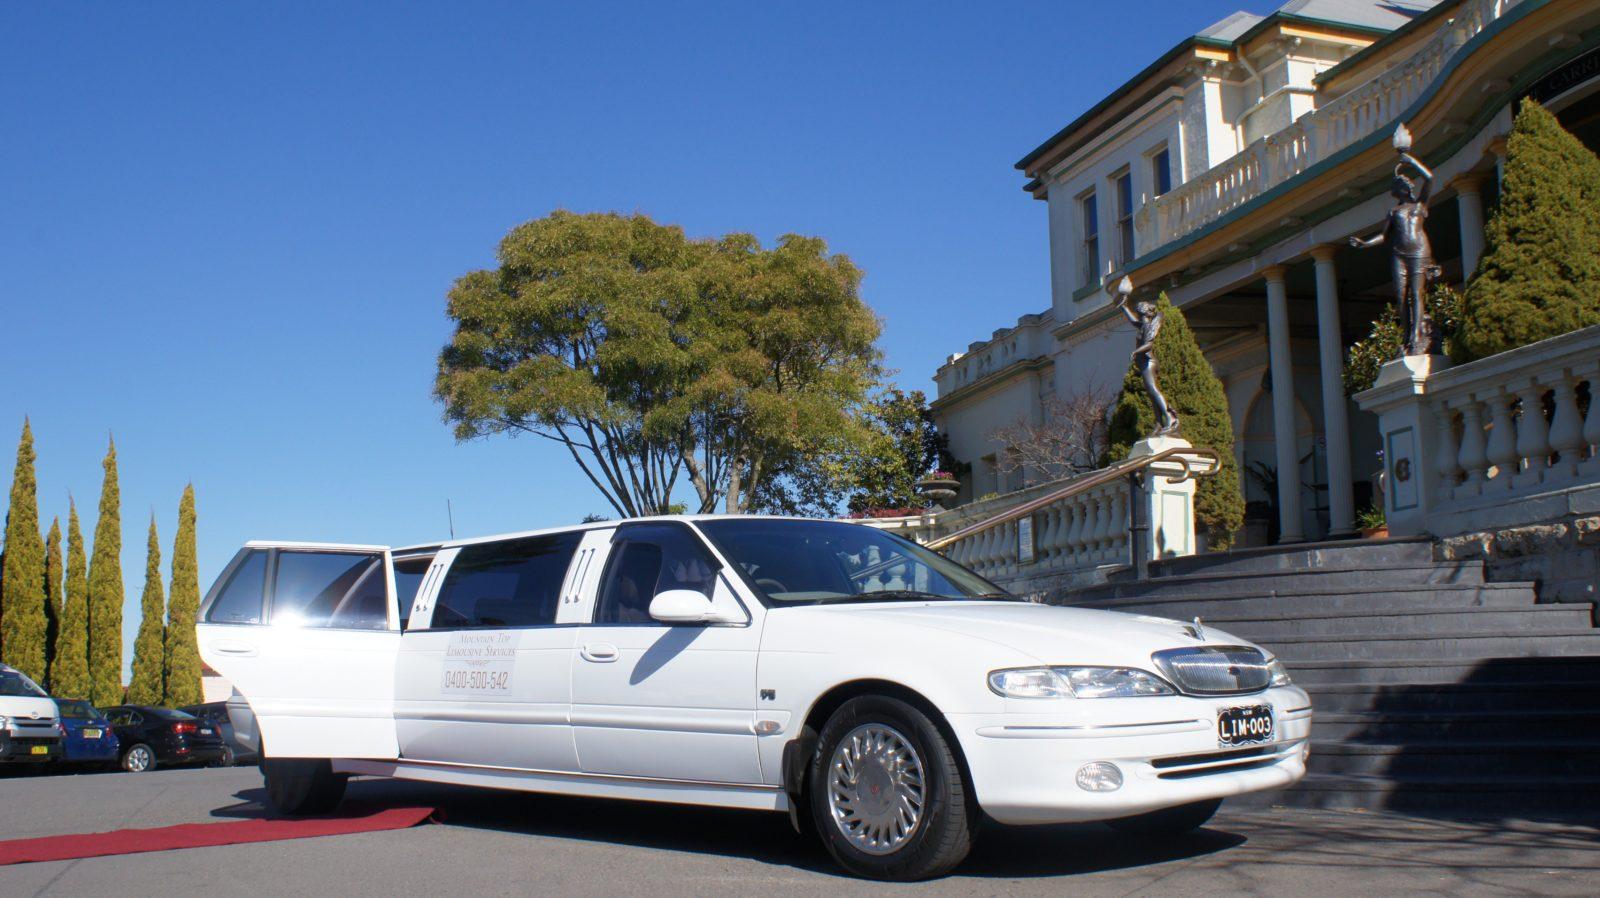 Our Limousine at the Carrington Hotel, Katoomba